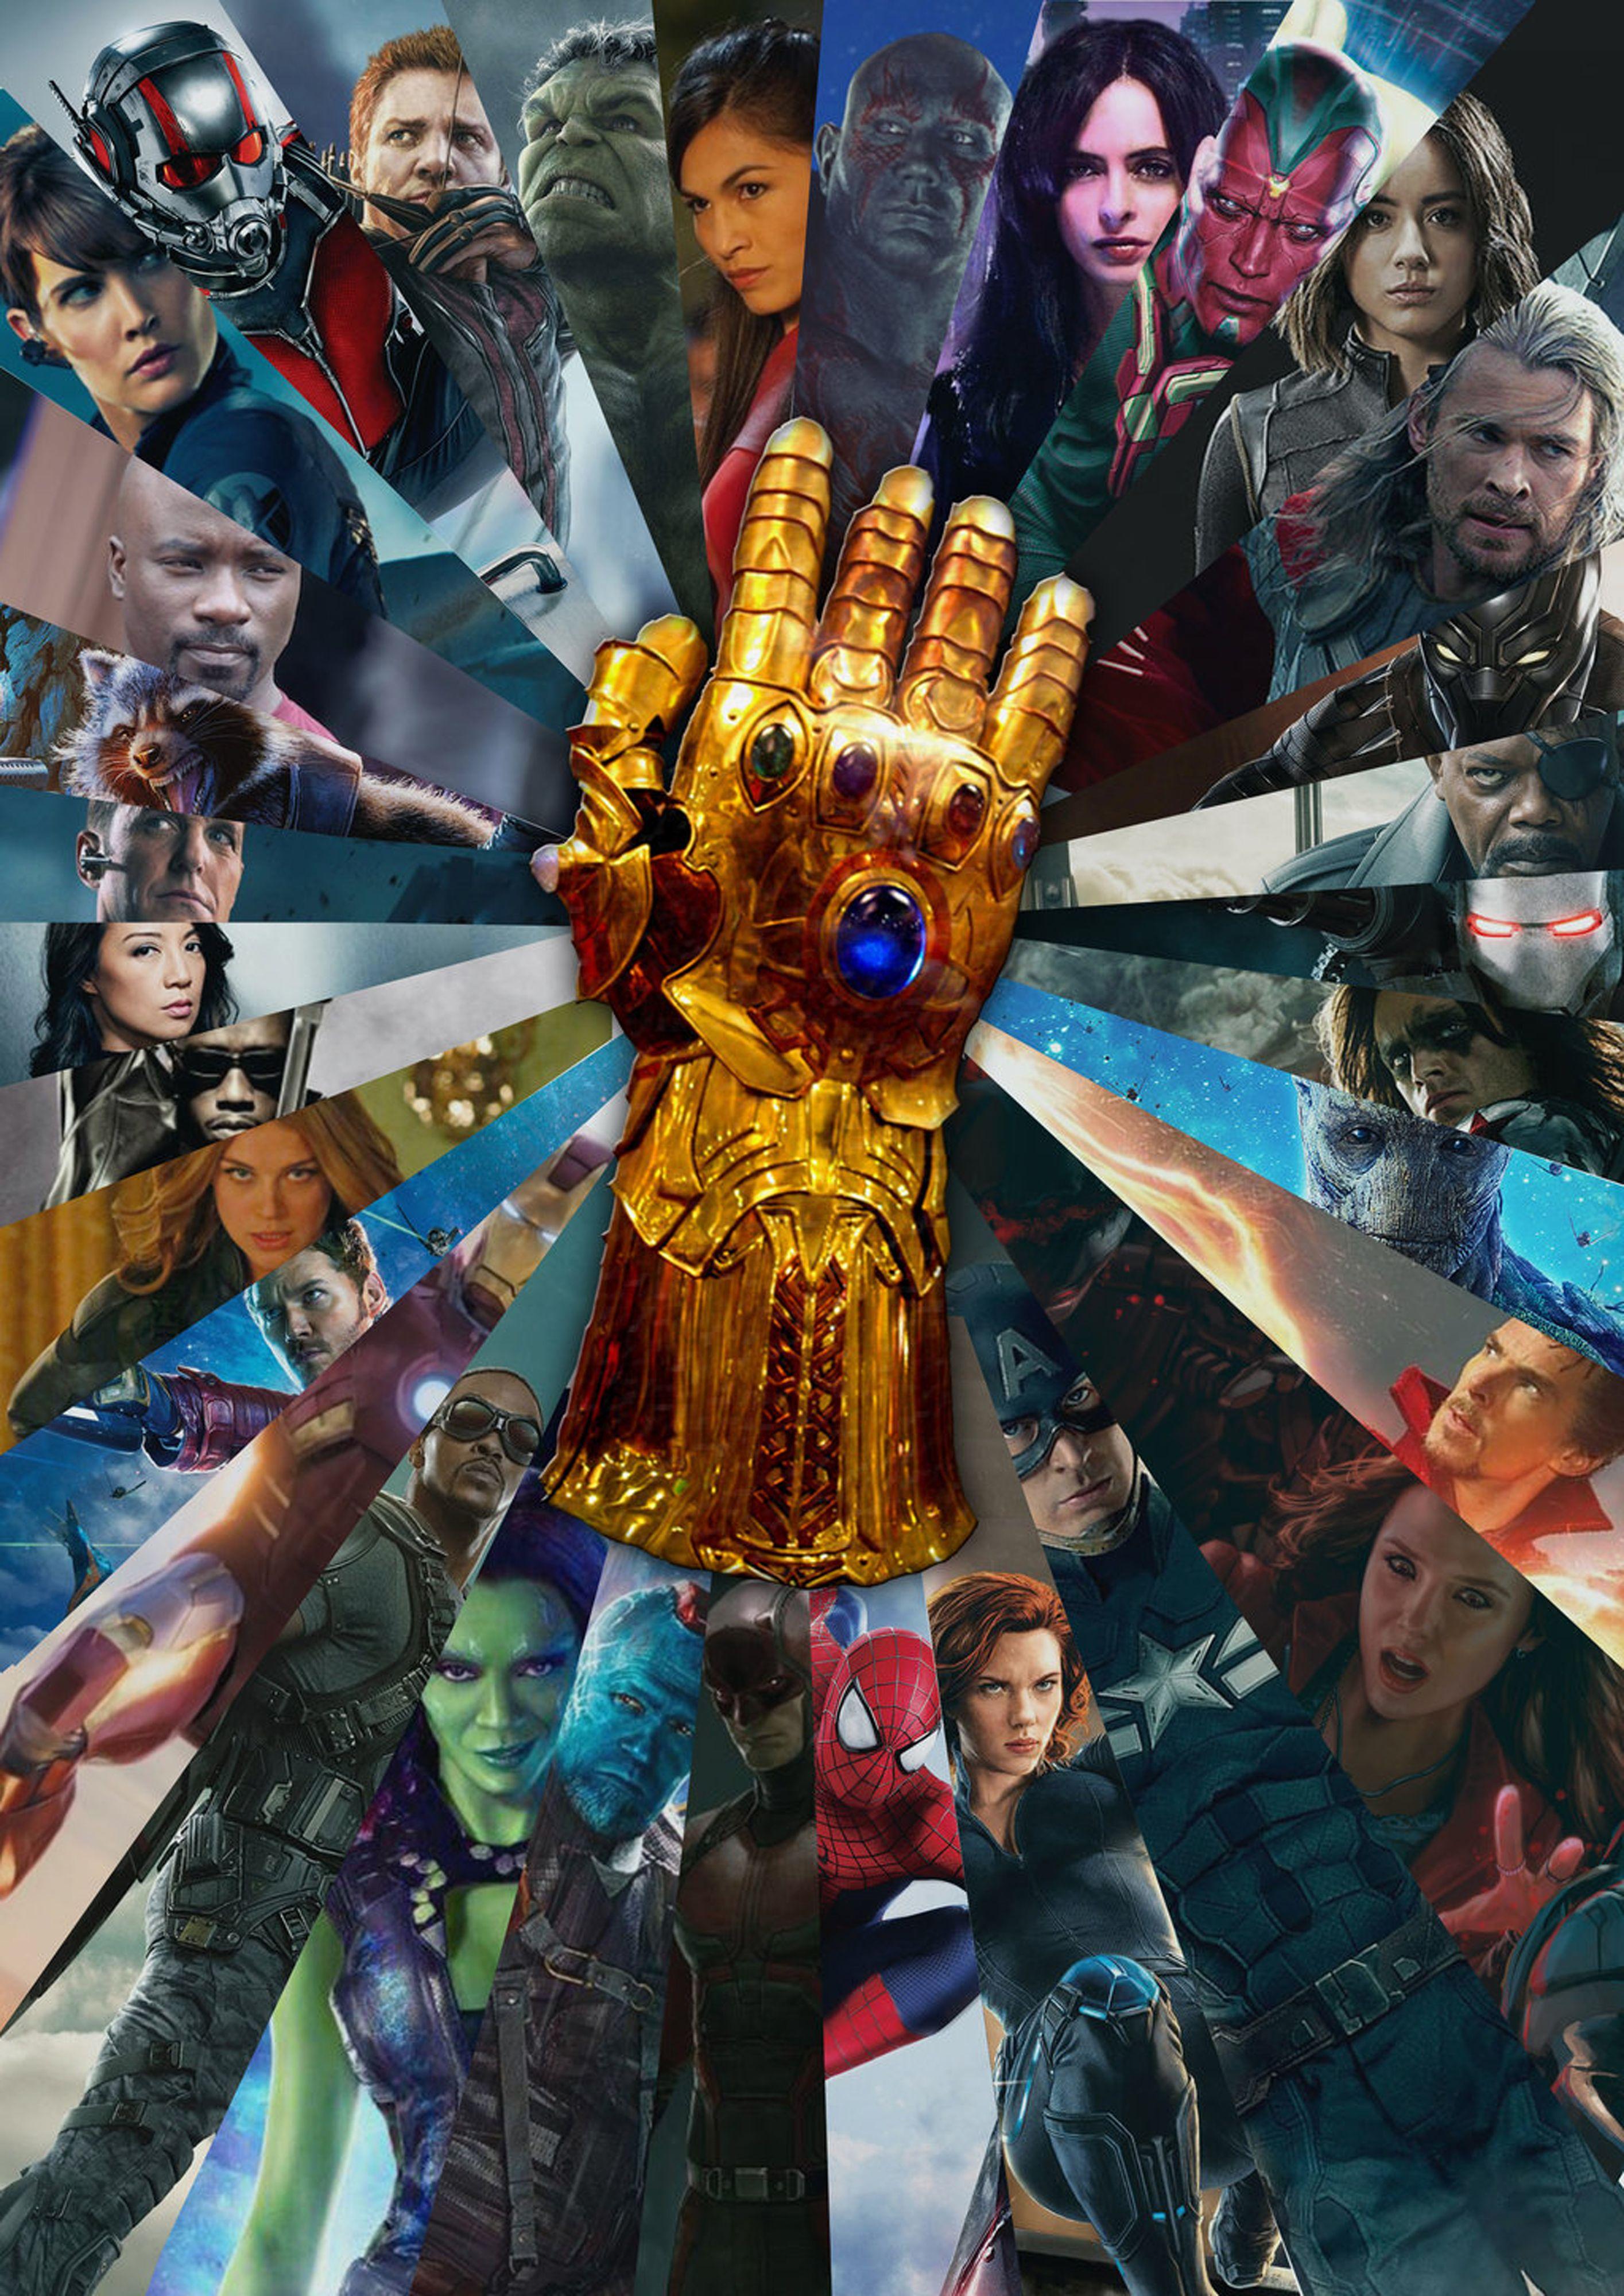 Simple Thanoscopter Infinity War Wallpaper - 11f43d901903ab10ccd04ec1ddd9bbc1  Gallery_65126 .jpg